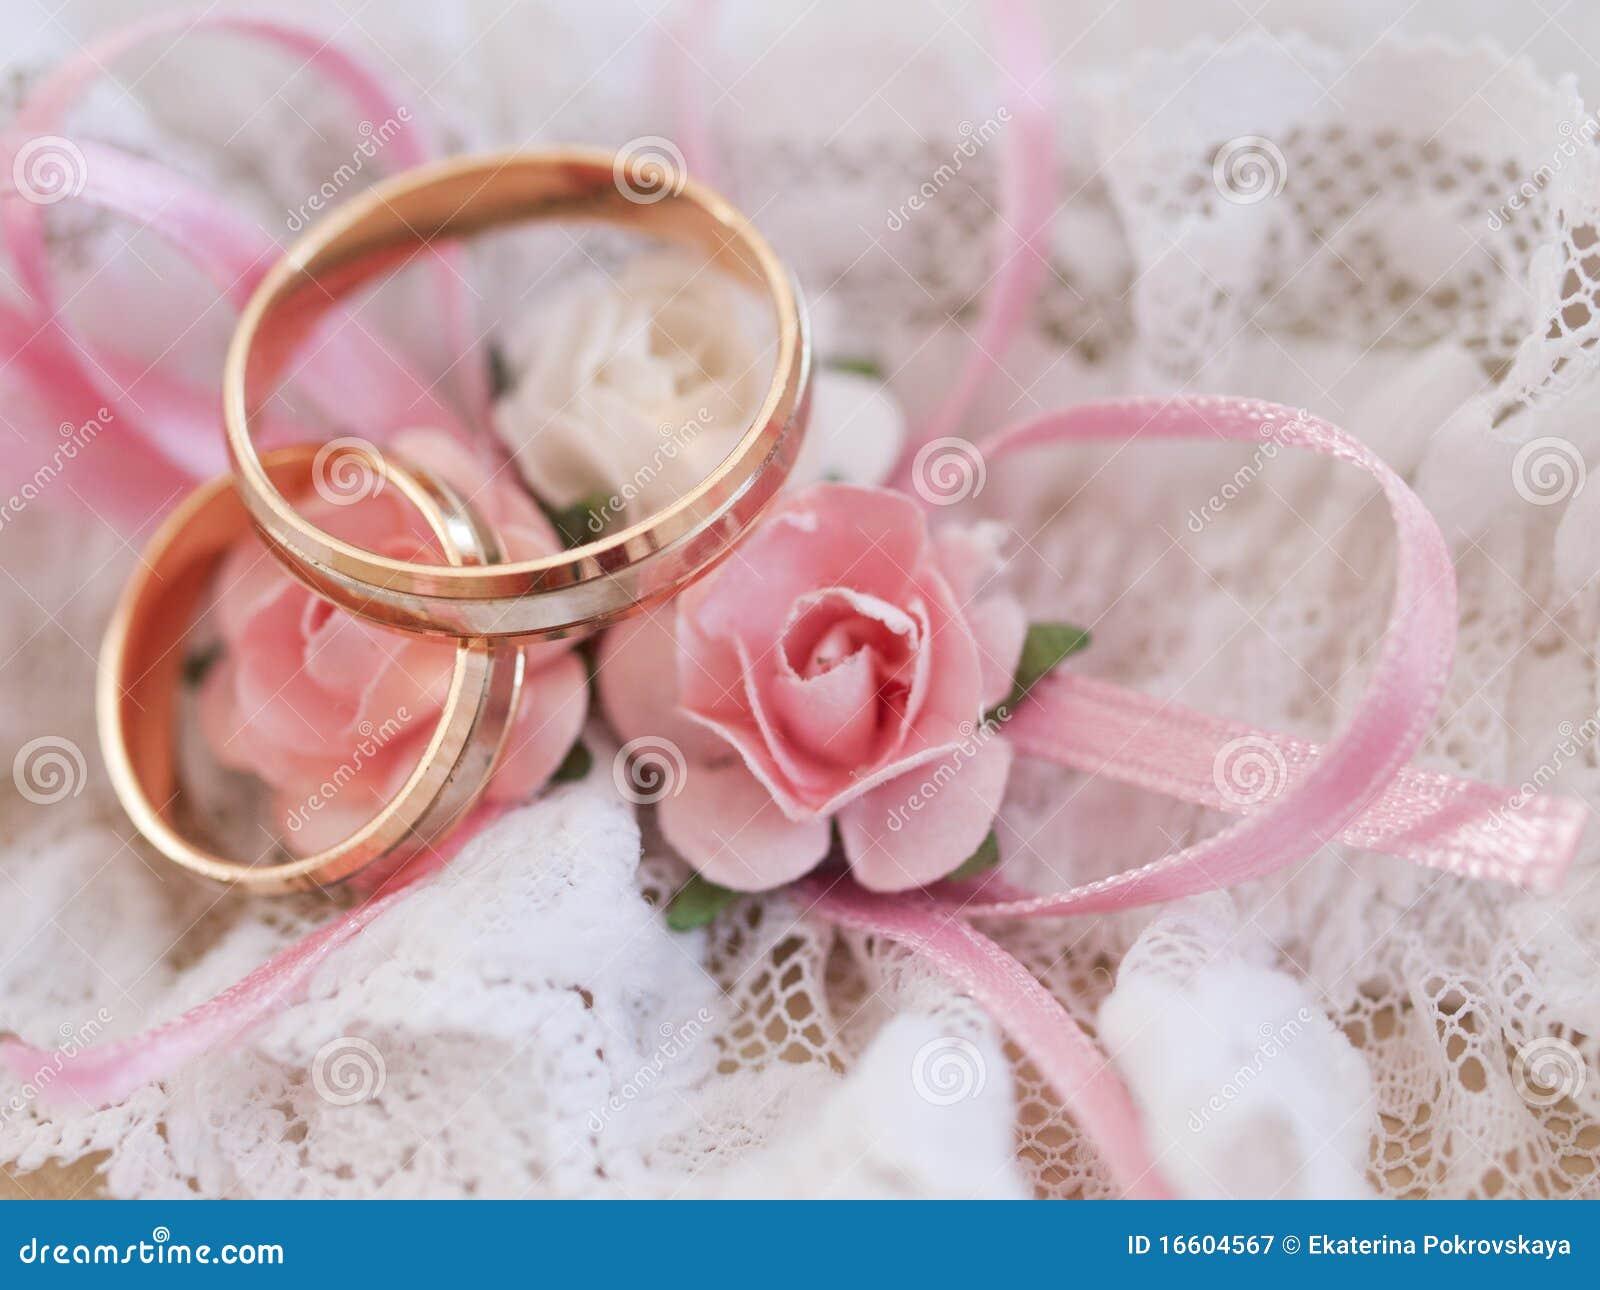 Wedding rings stock image. Image of harmony, gold, closeup - 16604567